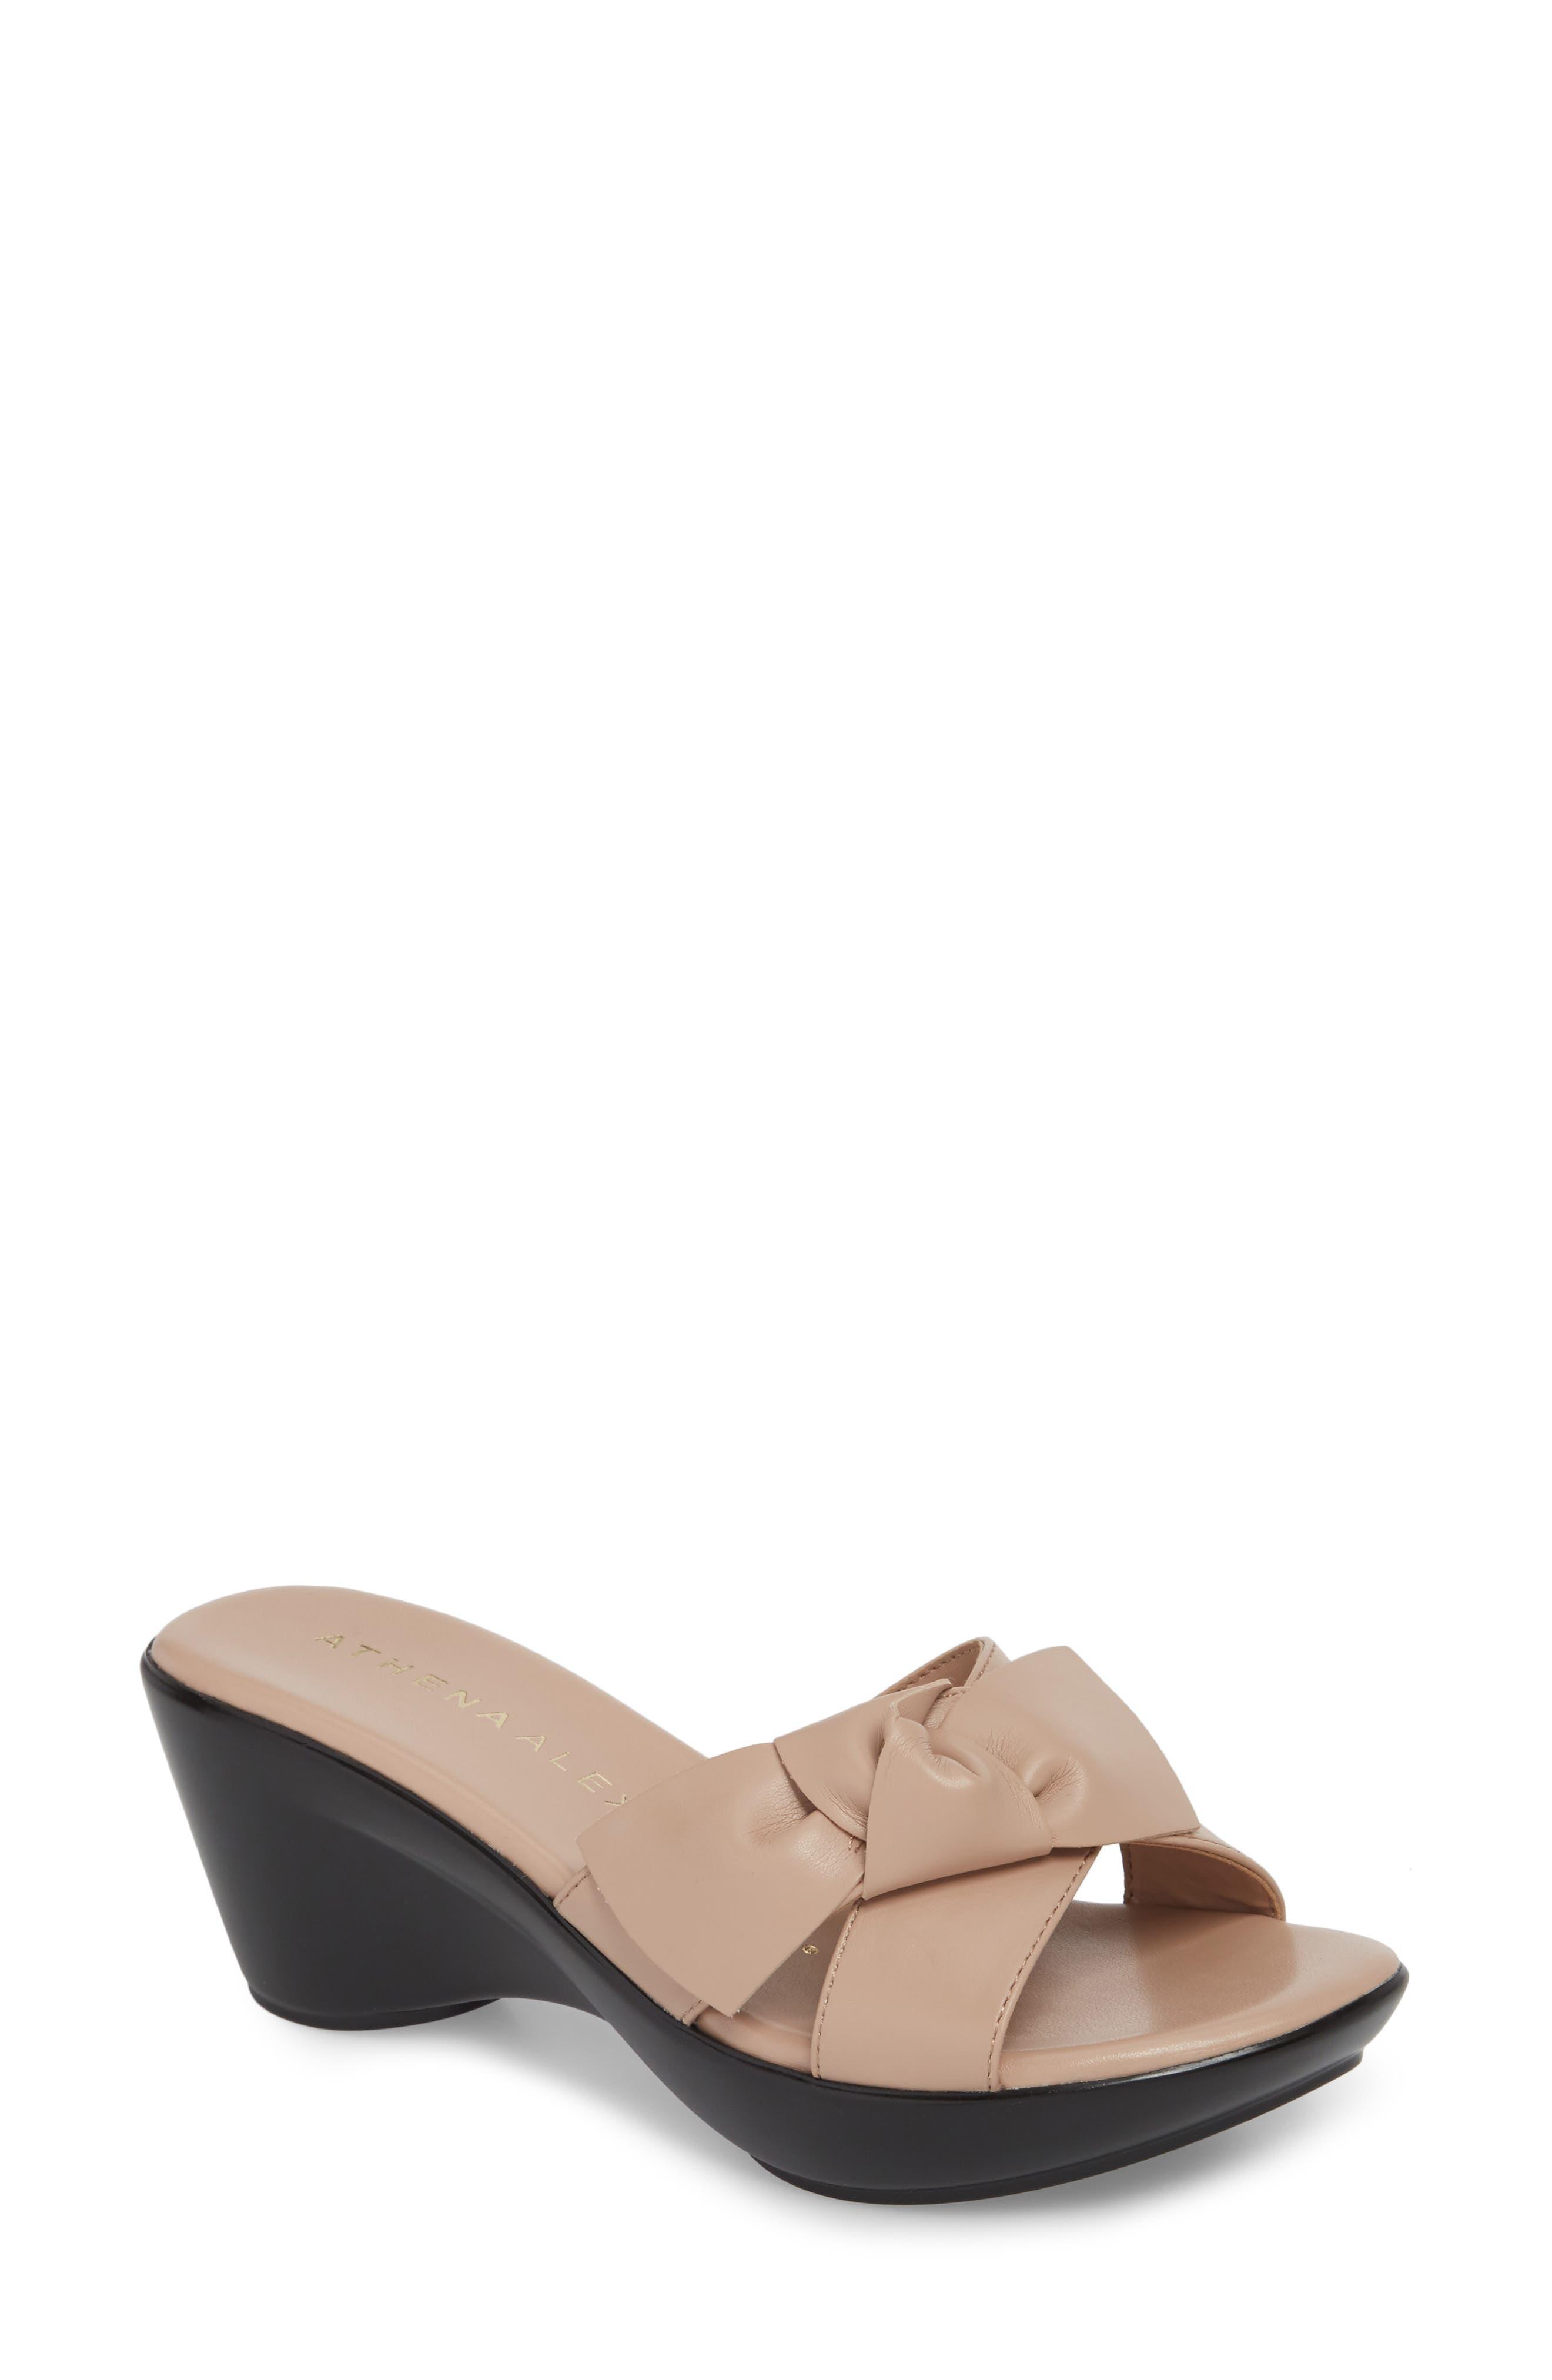 Athena Alexander Giada Wedge Sandal- Pink